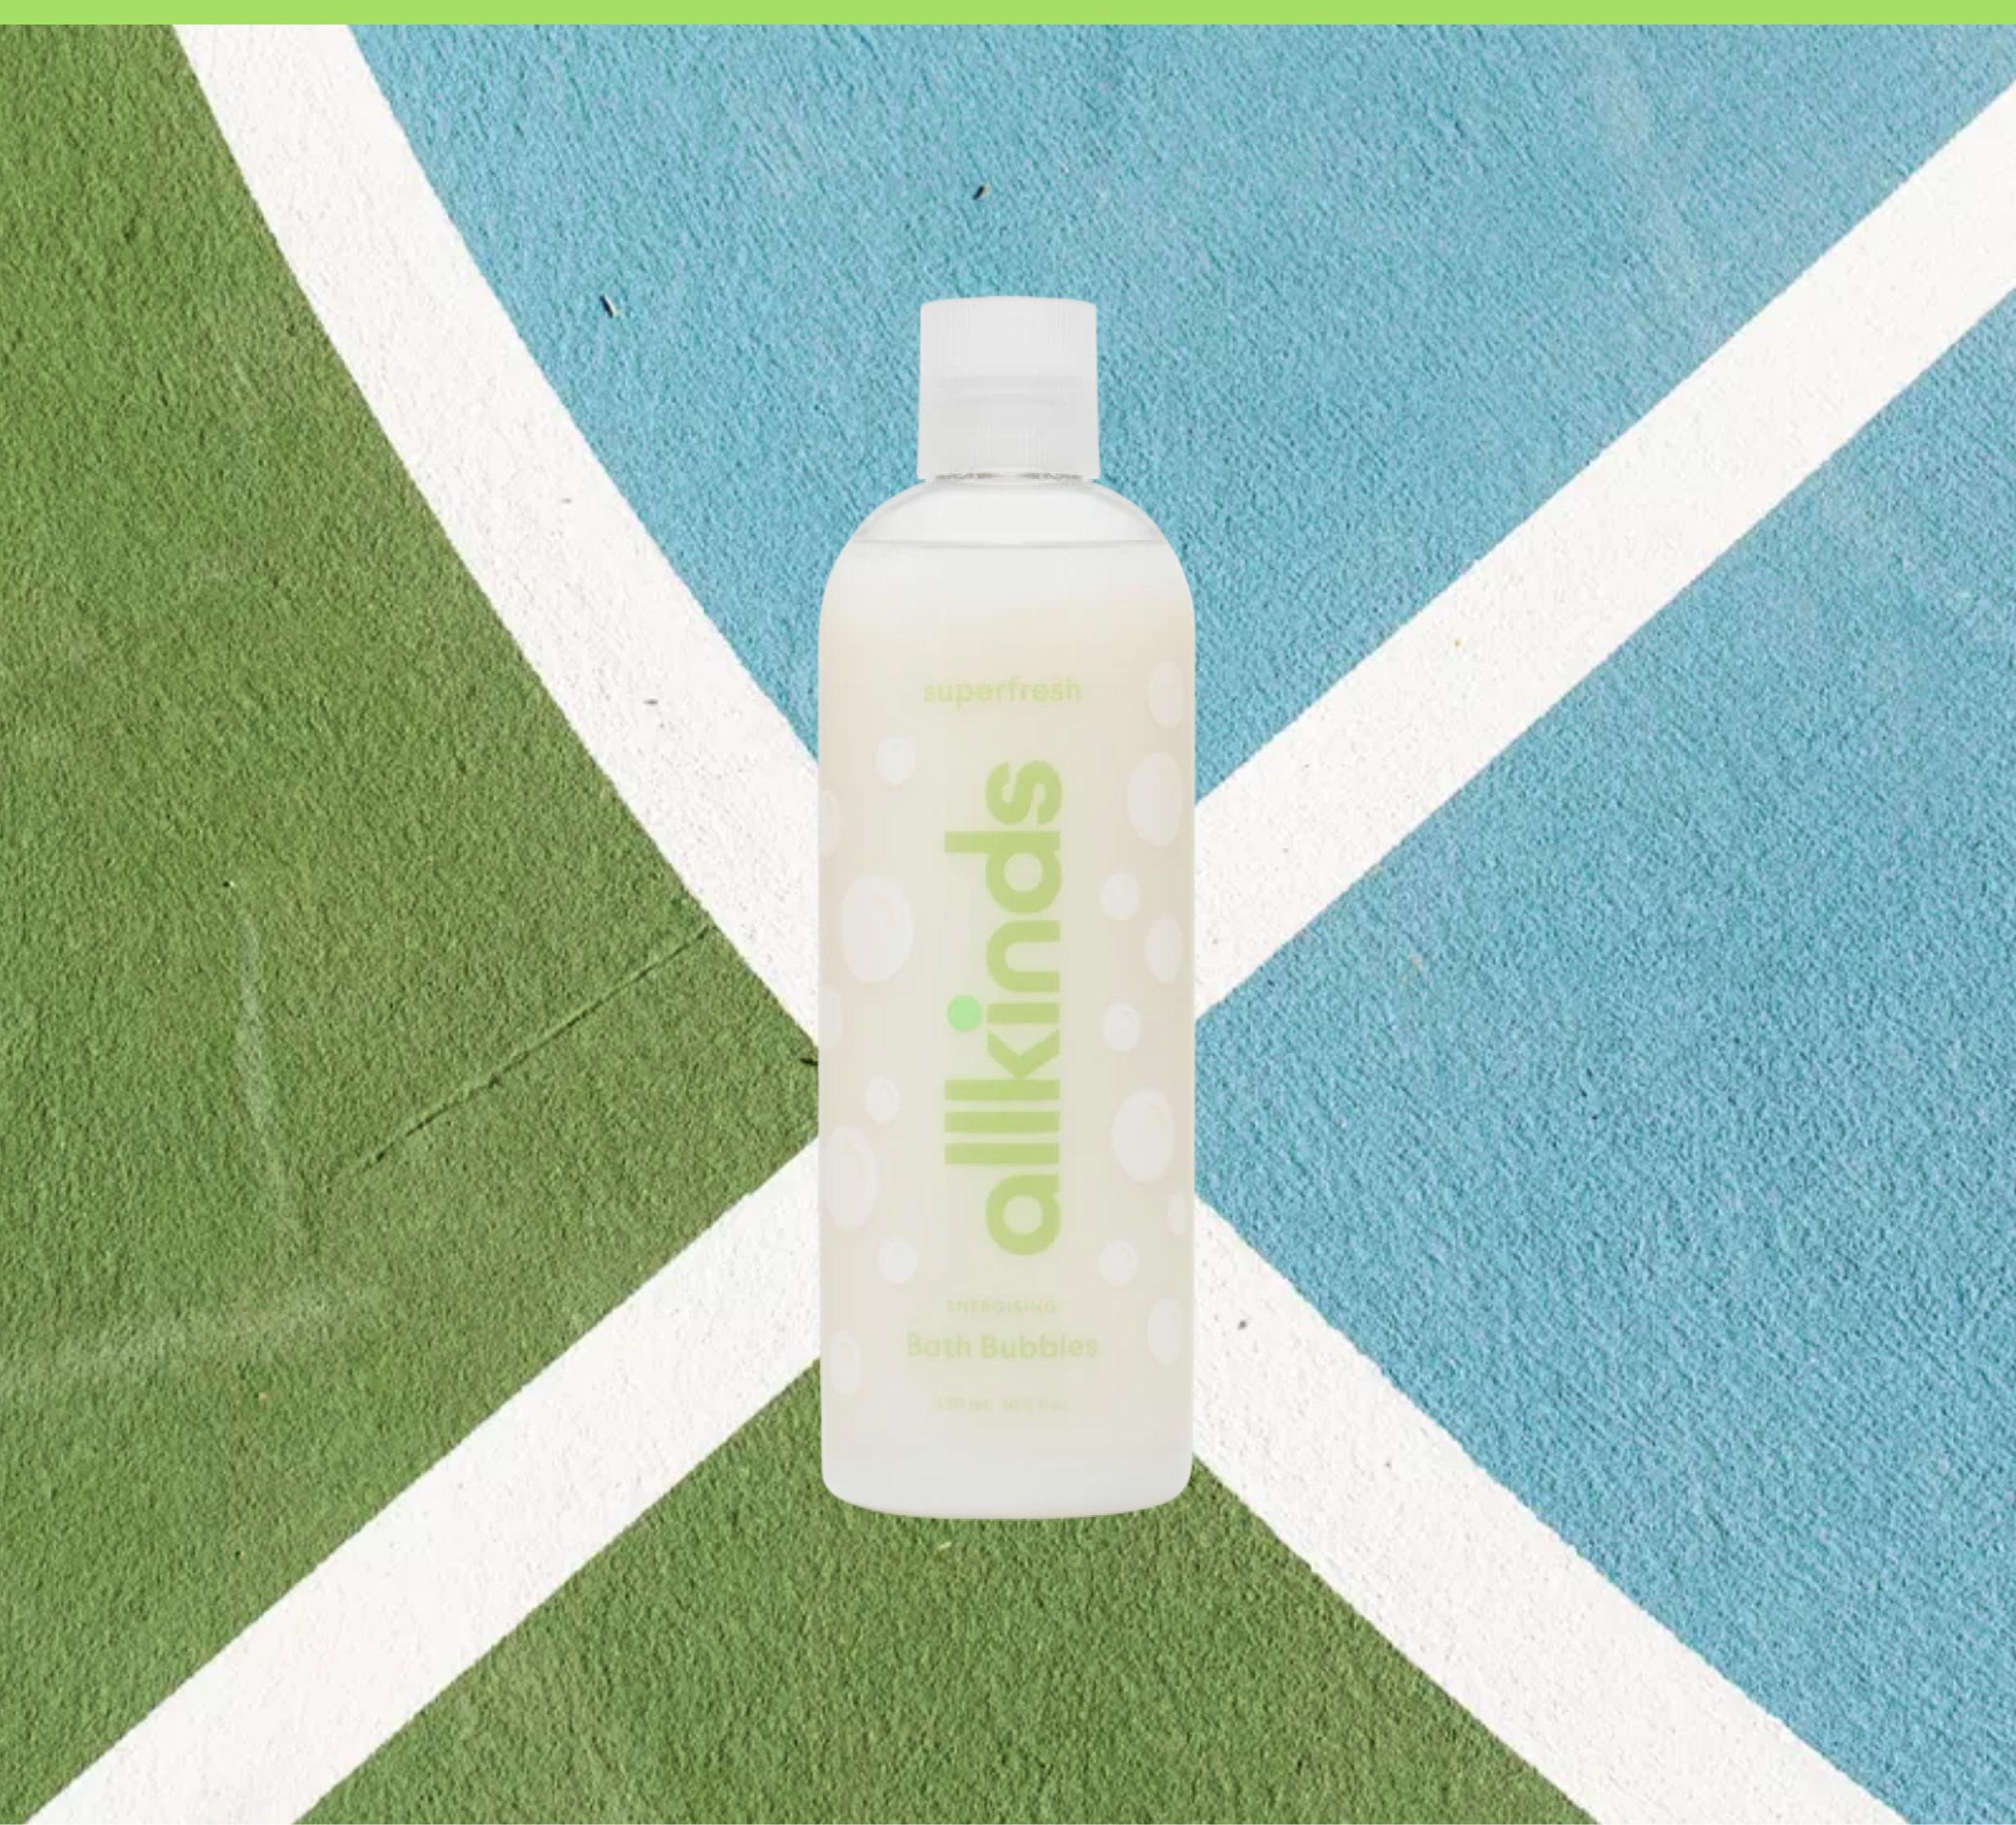 Allkinds Superfresh Bath Bubbles on a tennis court background